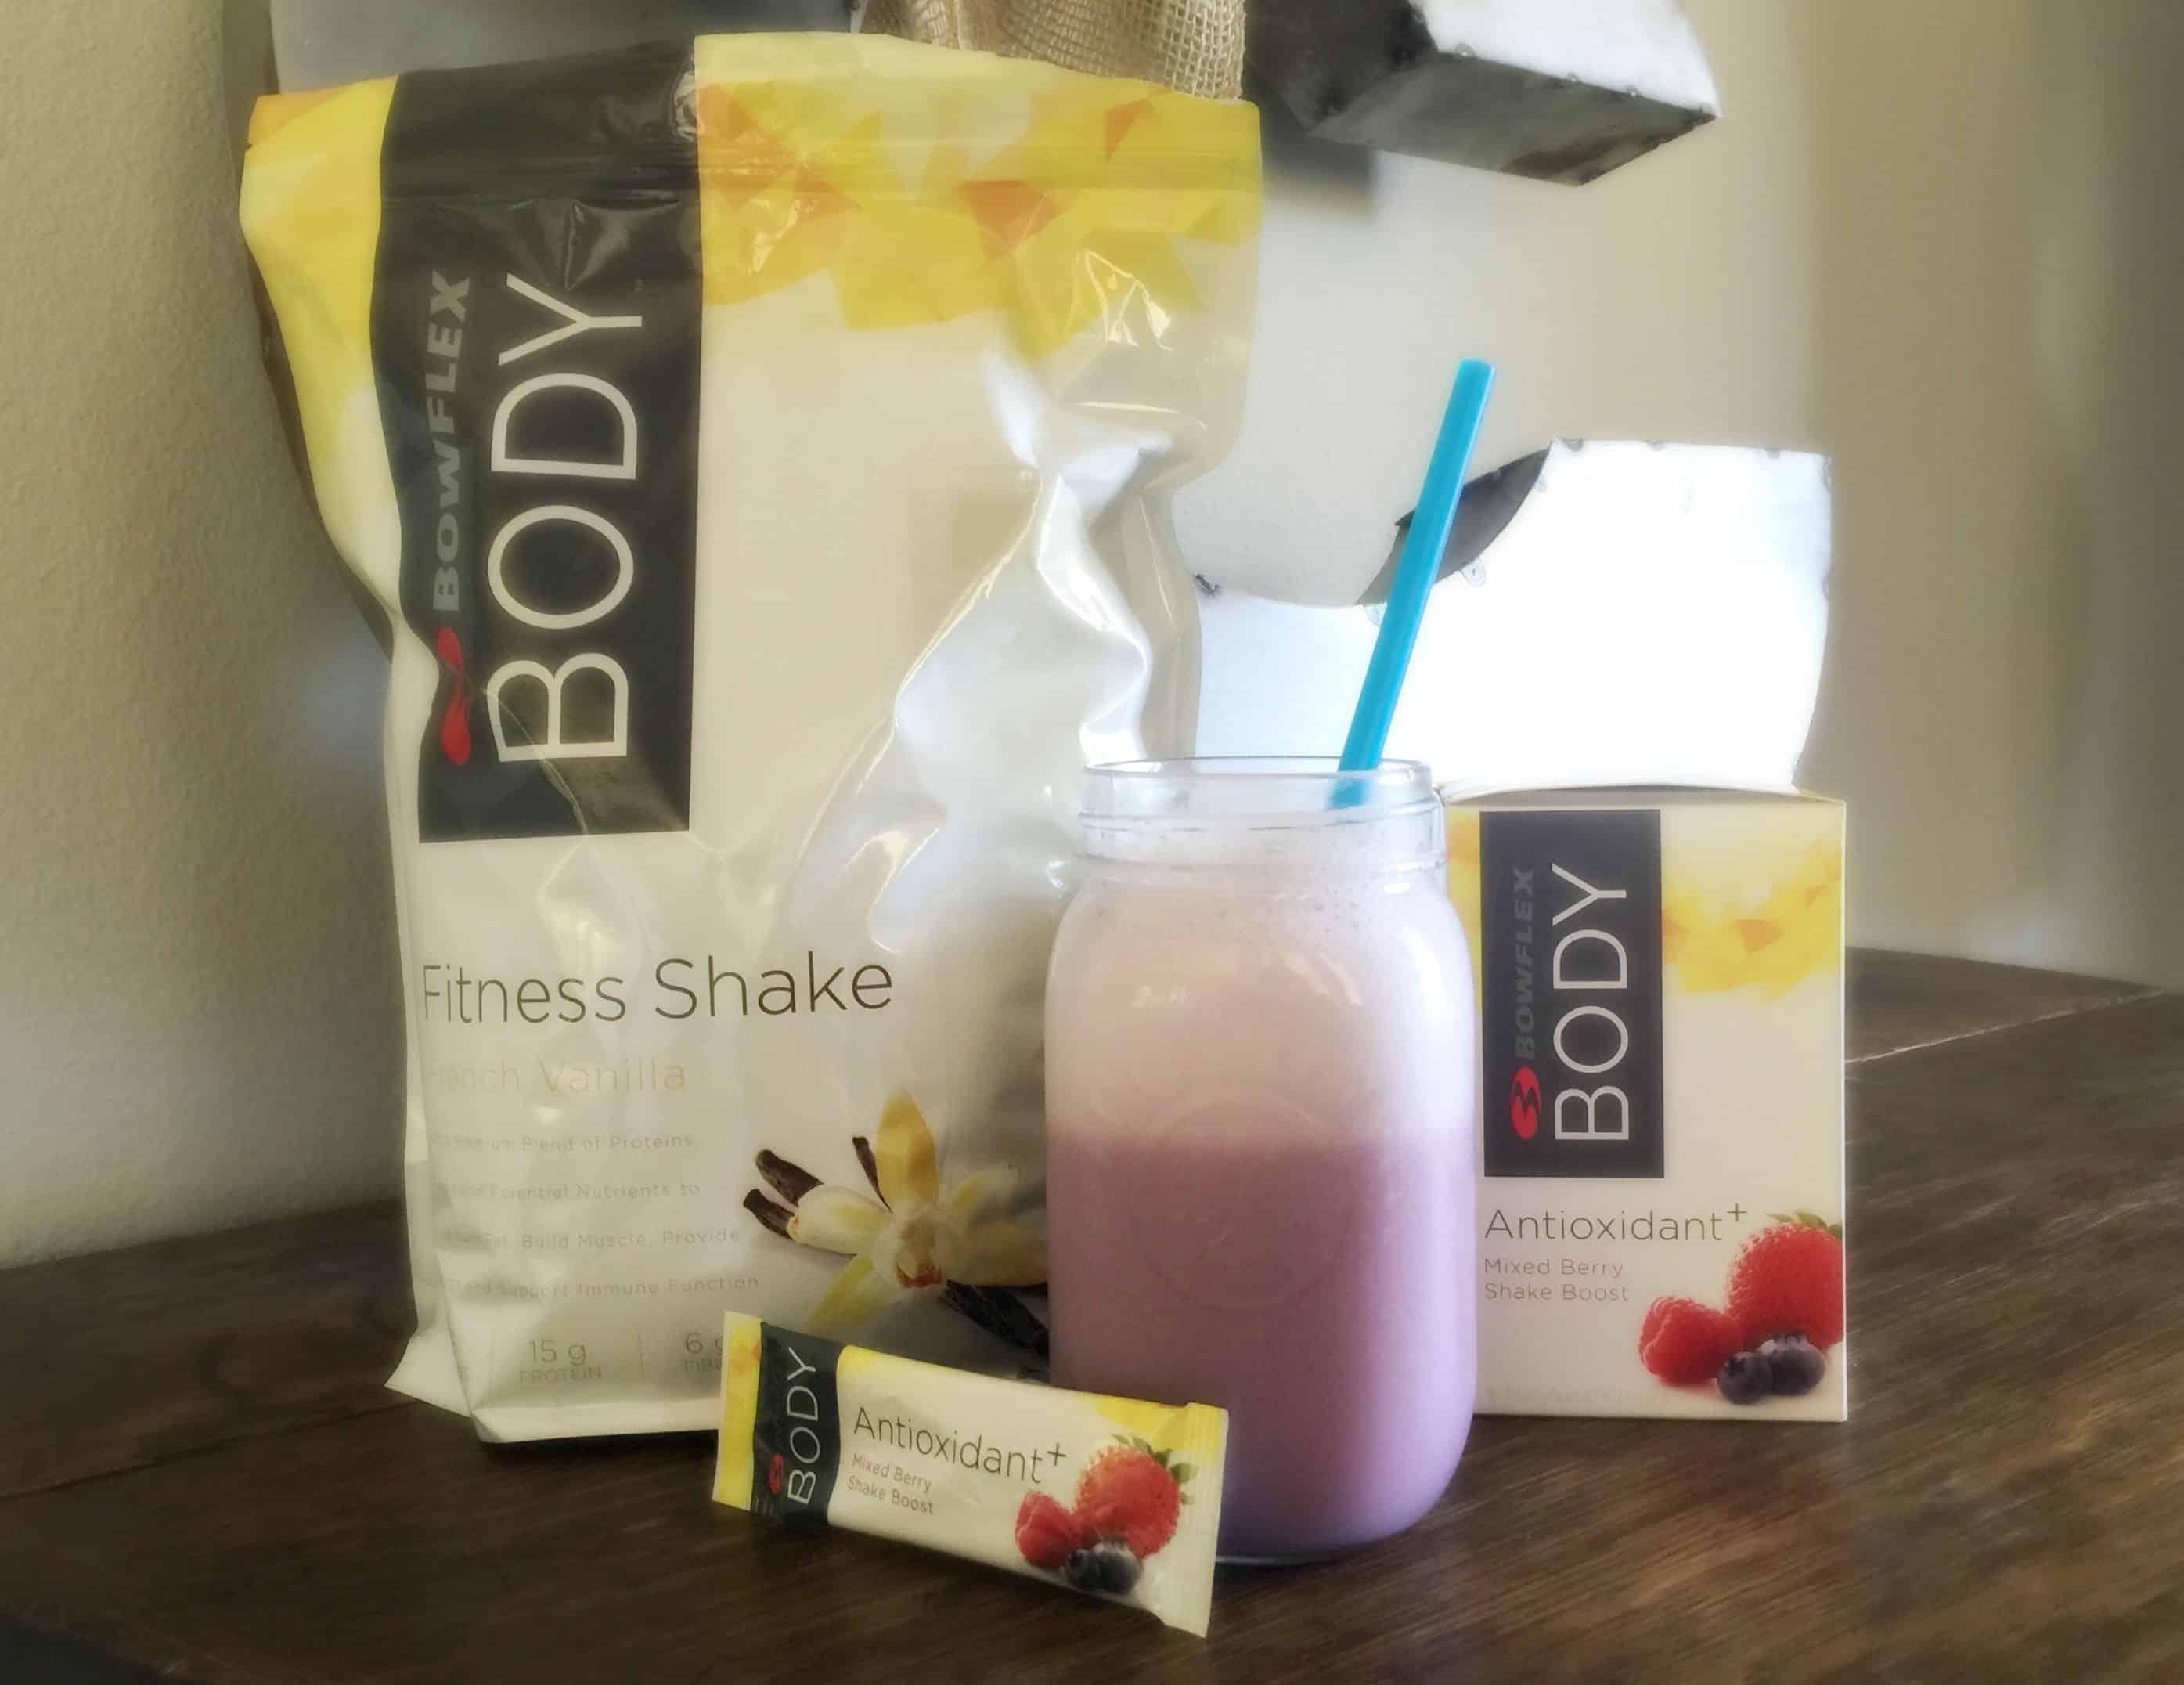 bowflex_antioxidant